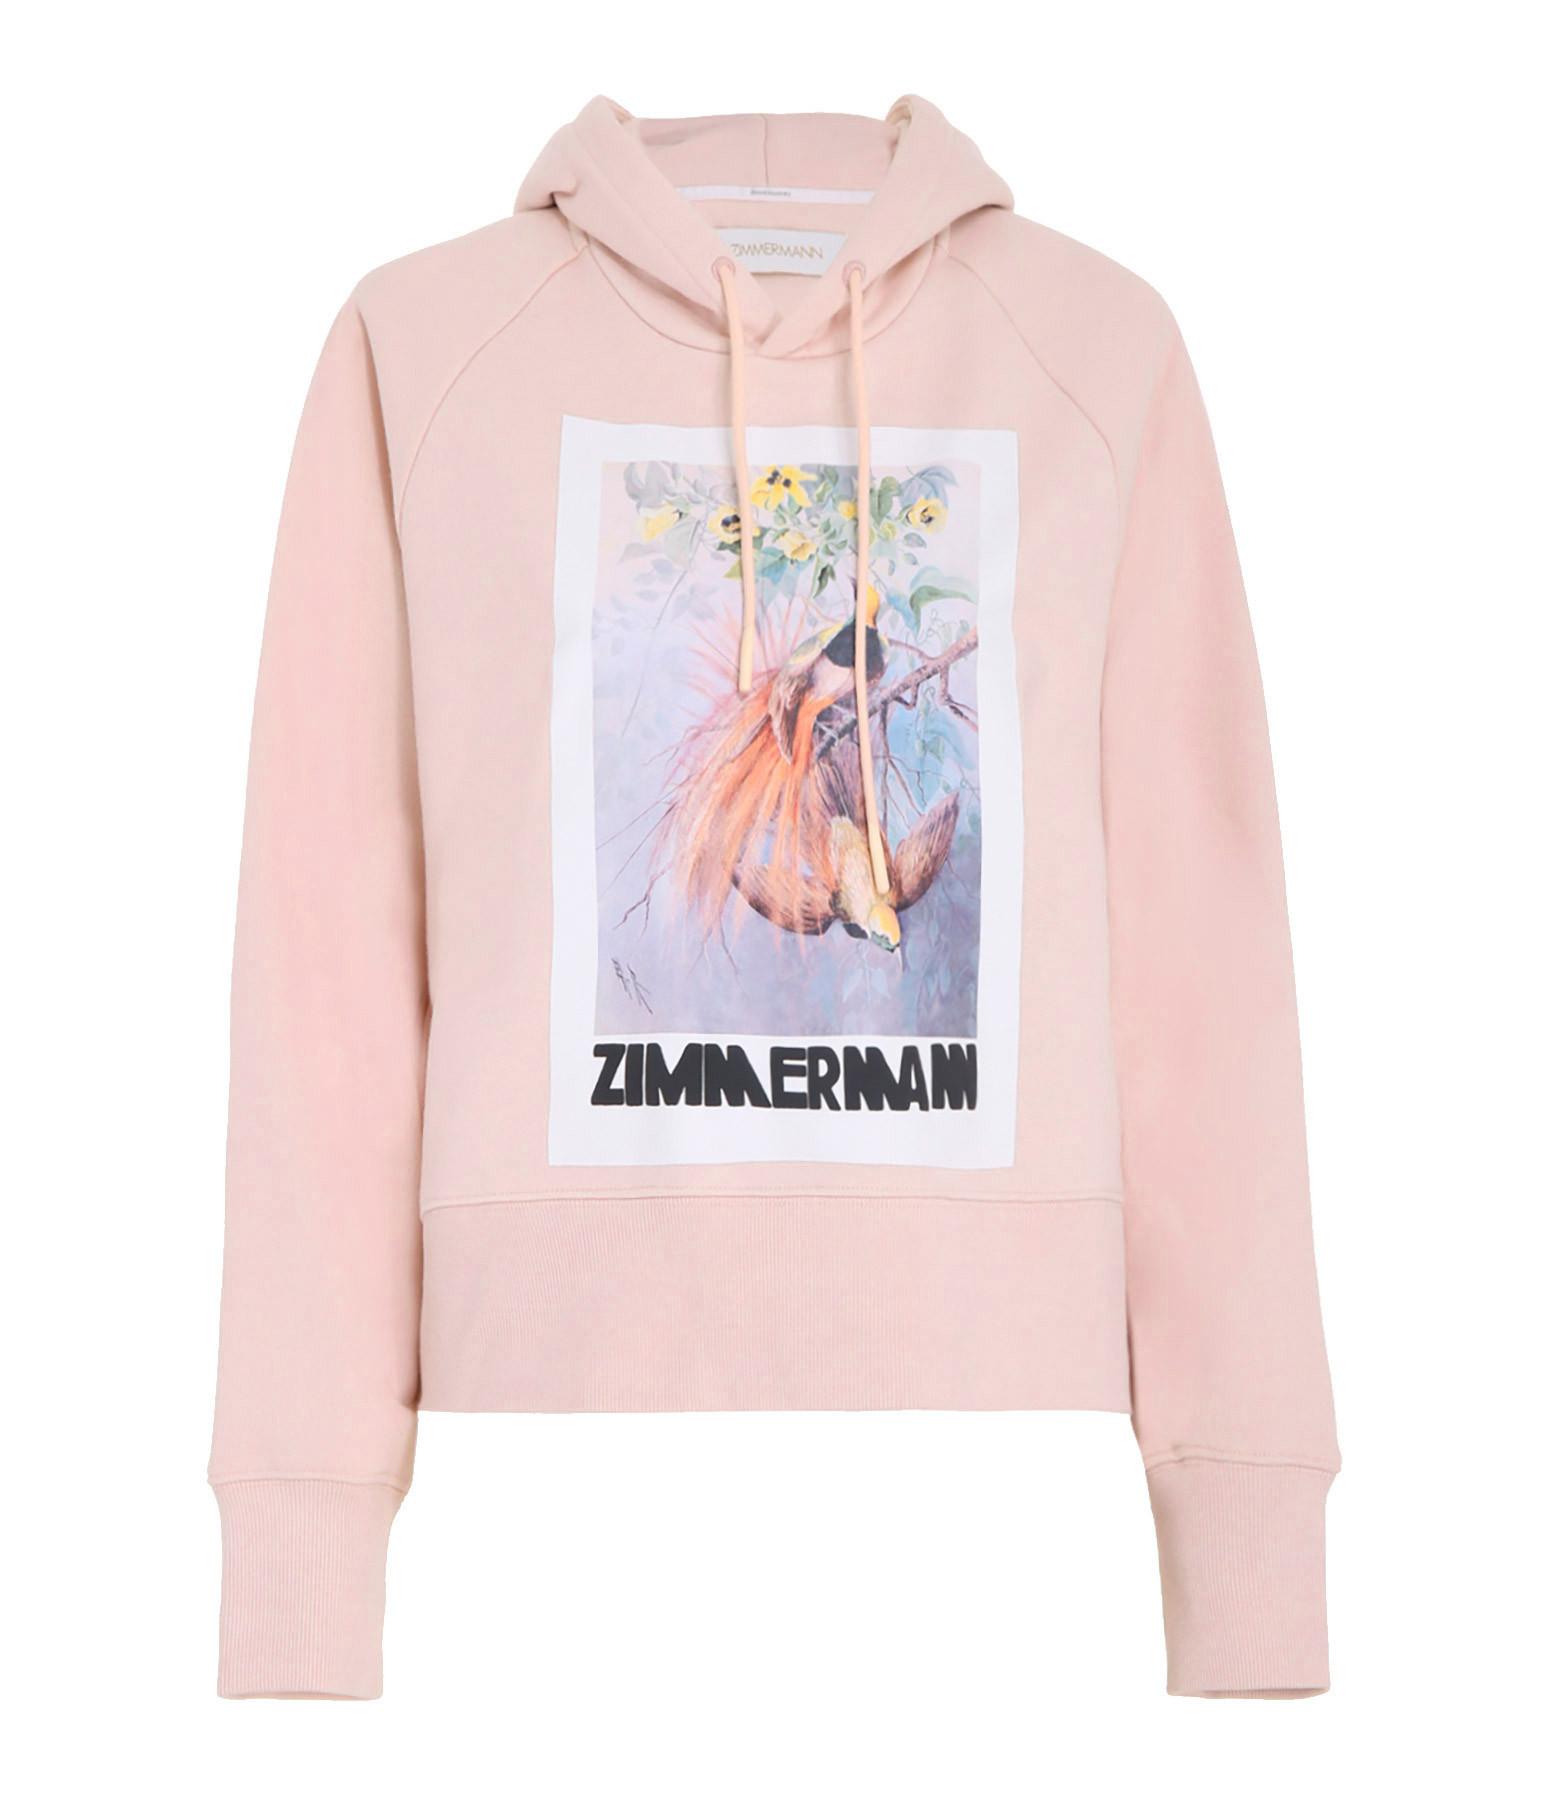 ZIMMERMANN - Sweatshirt Botanica Peony Rose